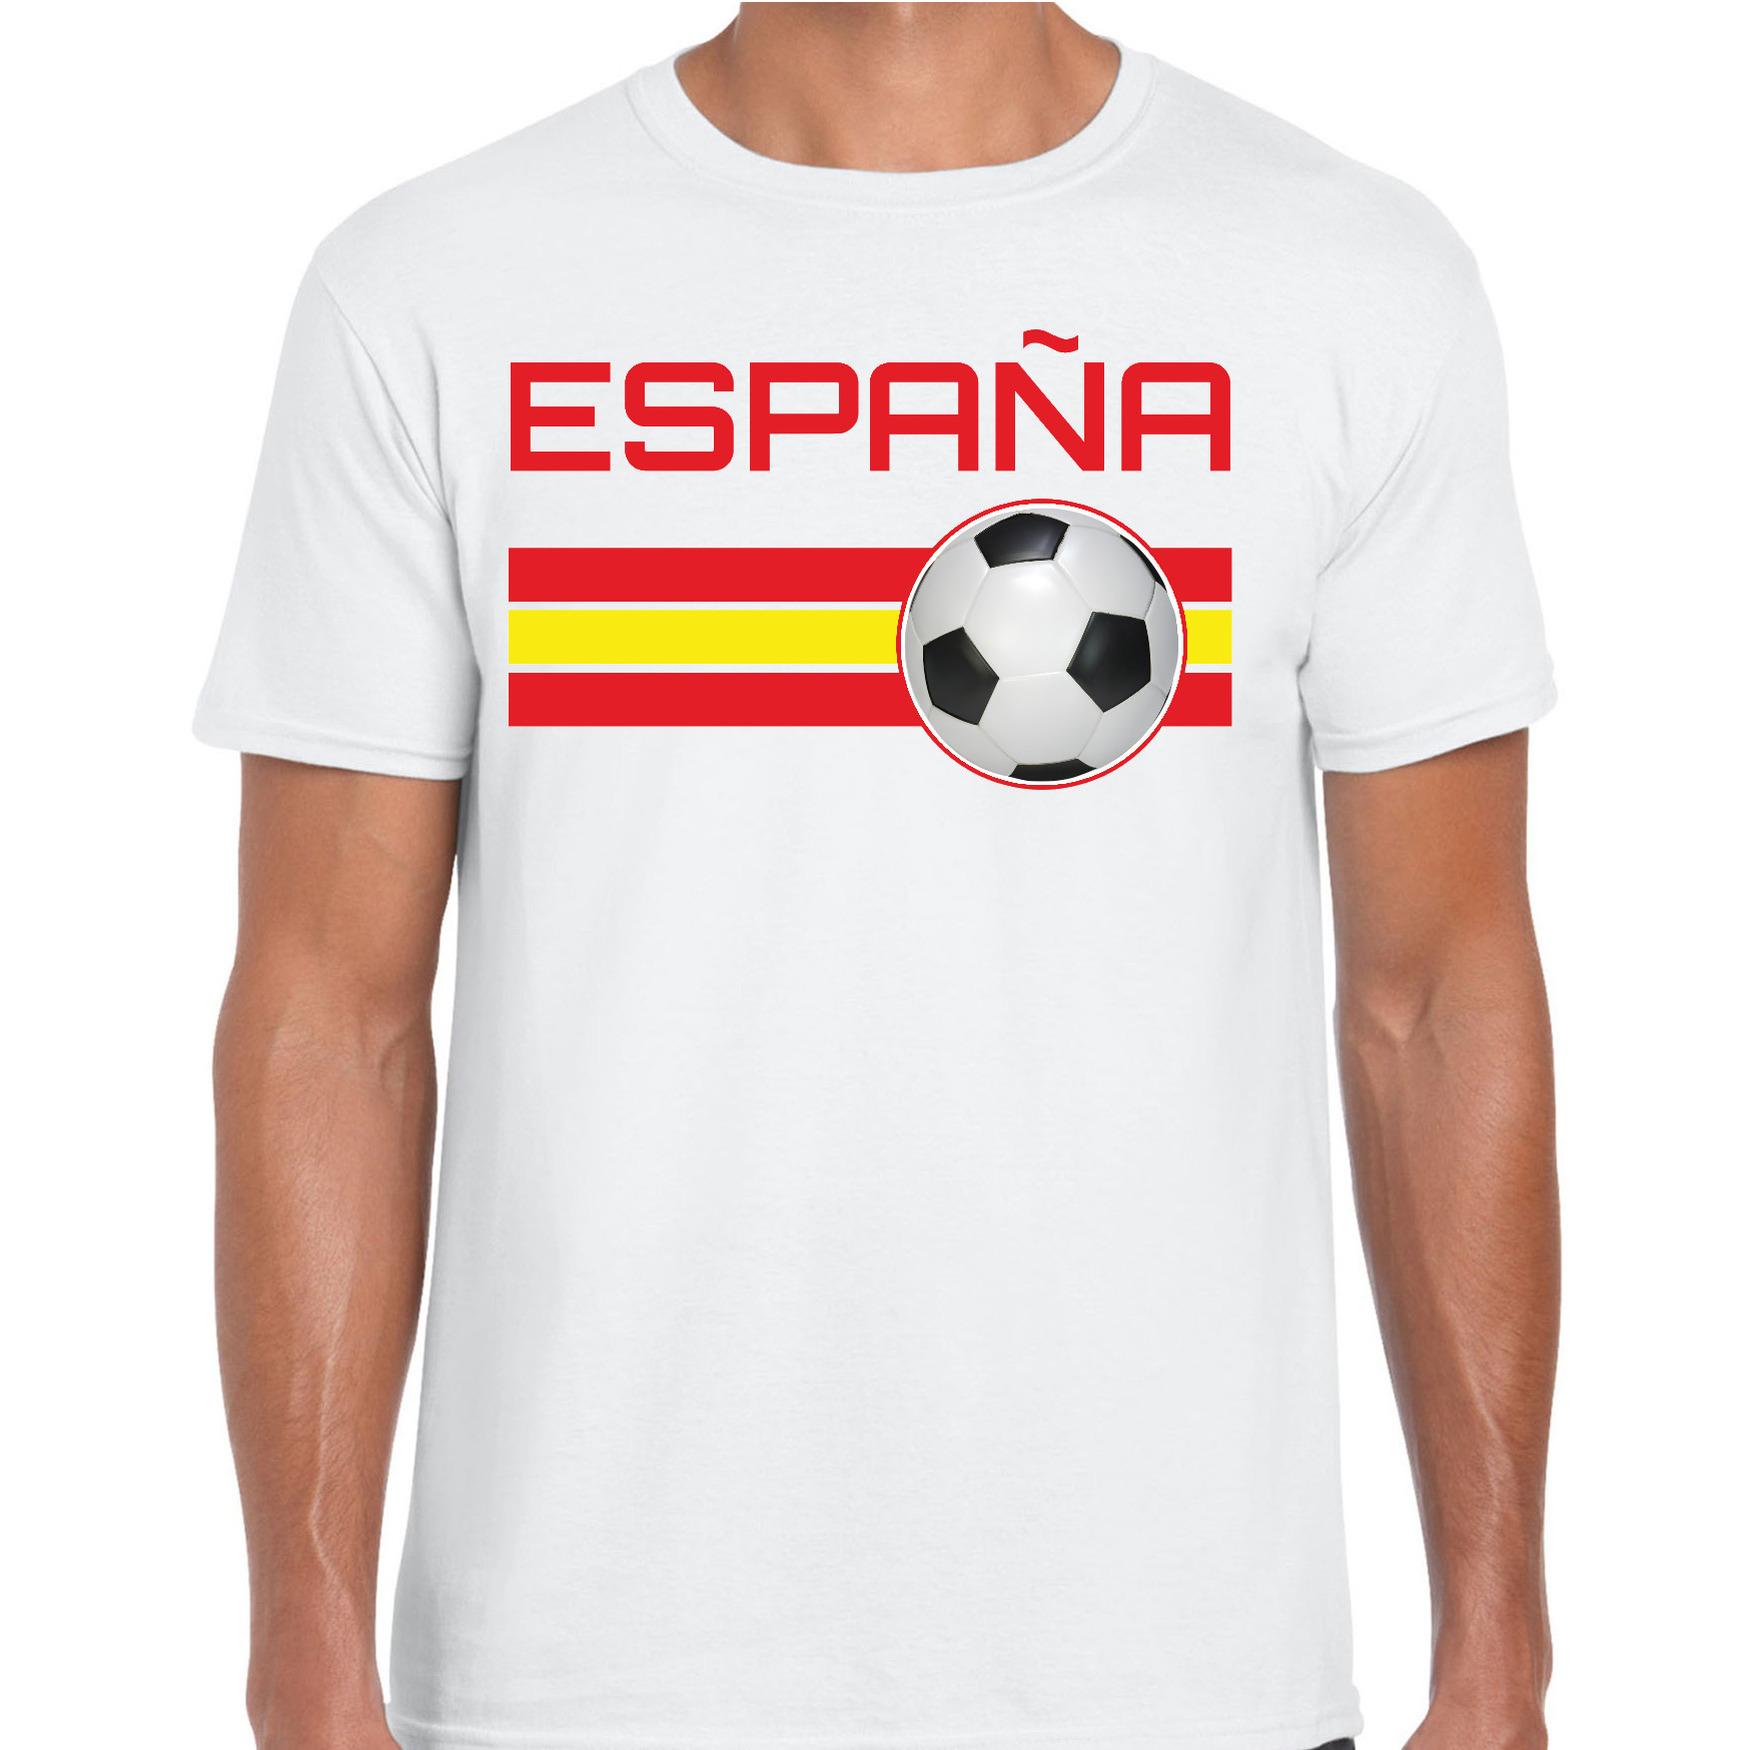 Espana / Spanje voetbal / landen t-shirt wit heren